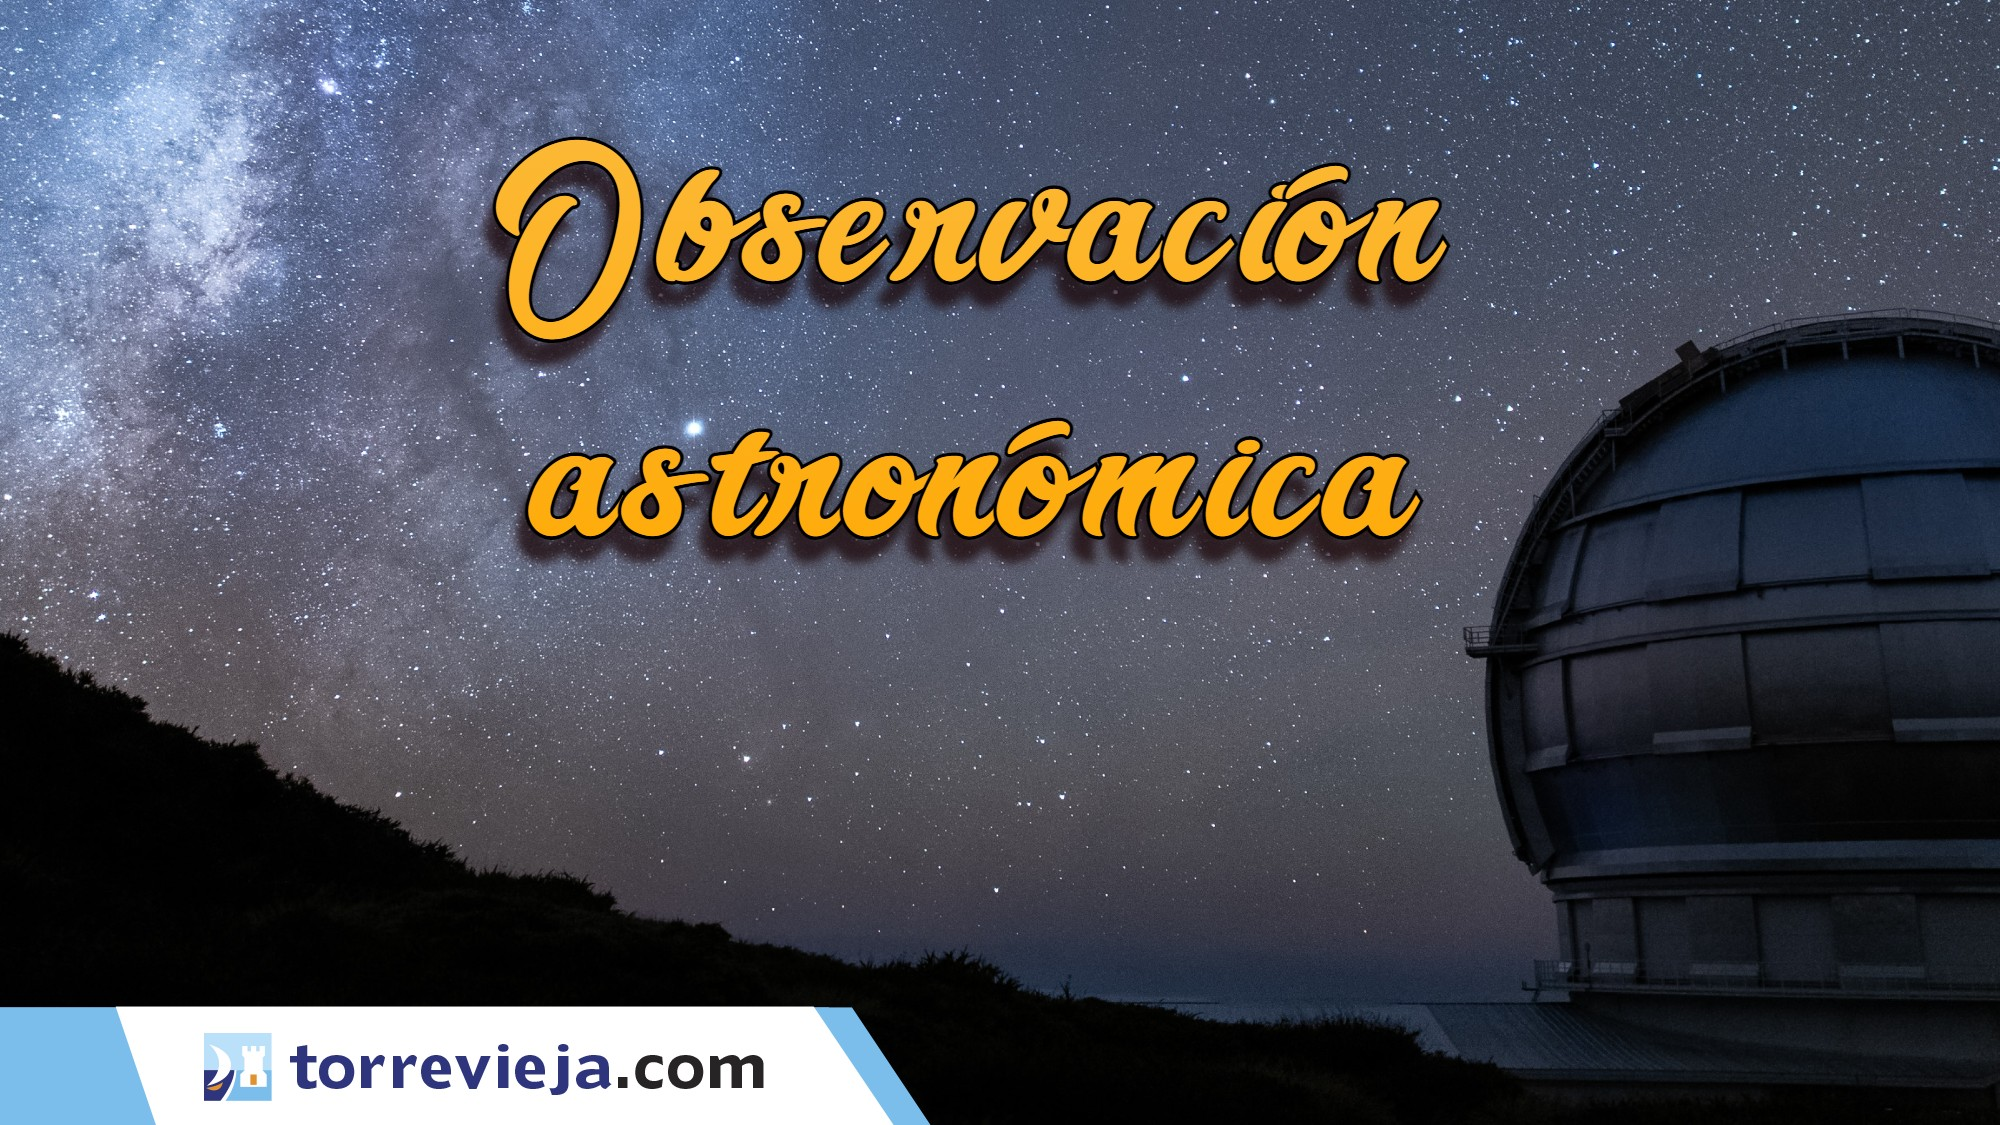 Астрономические наблюдения в Ла Мате